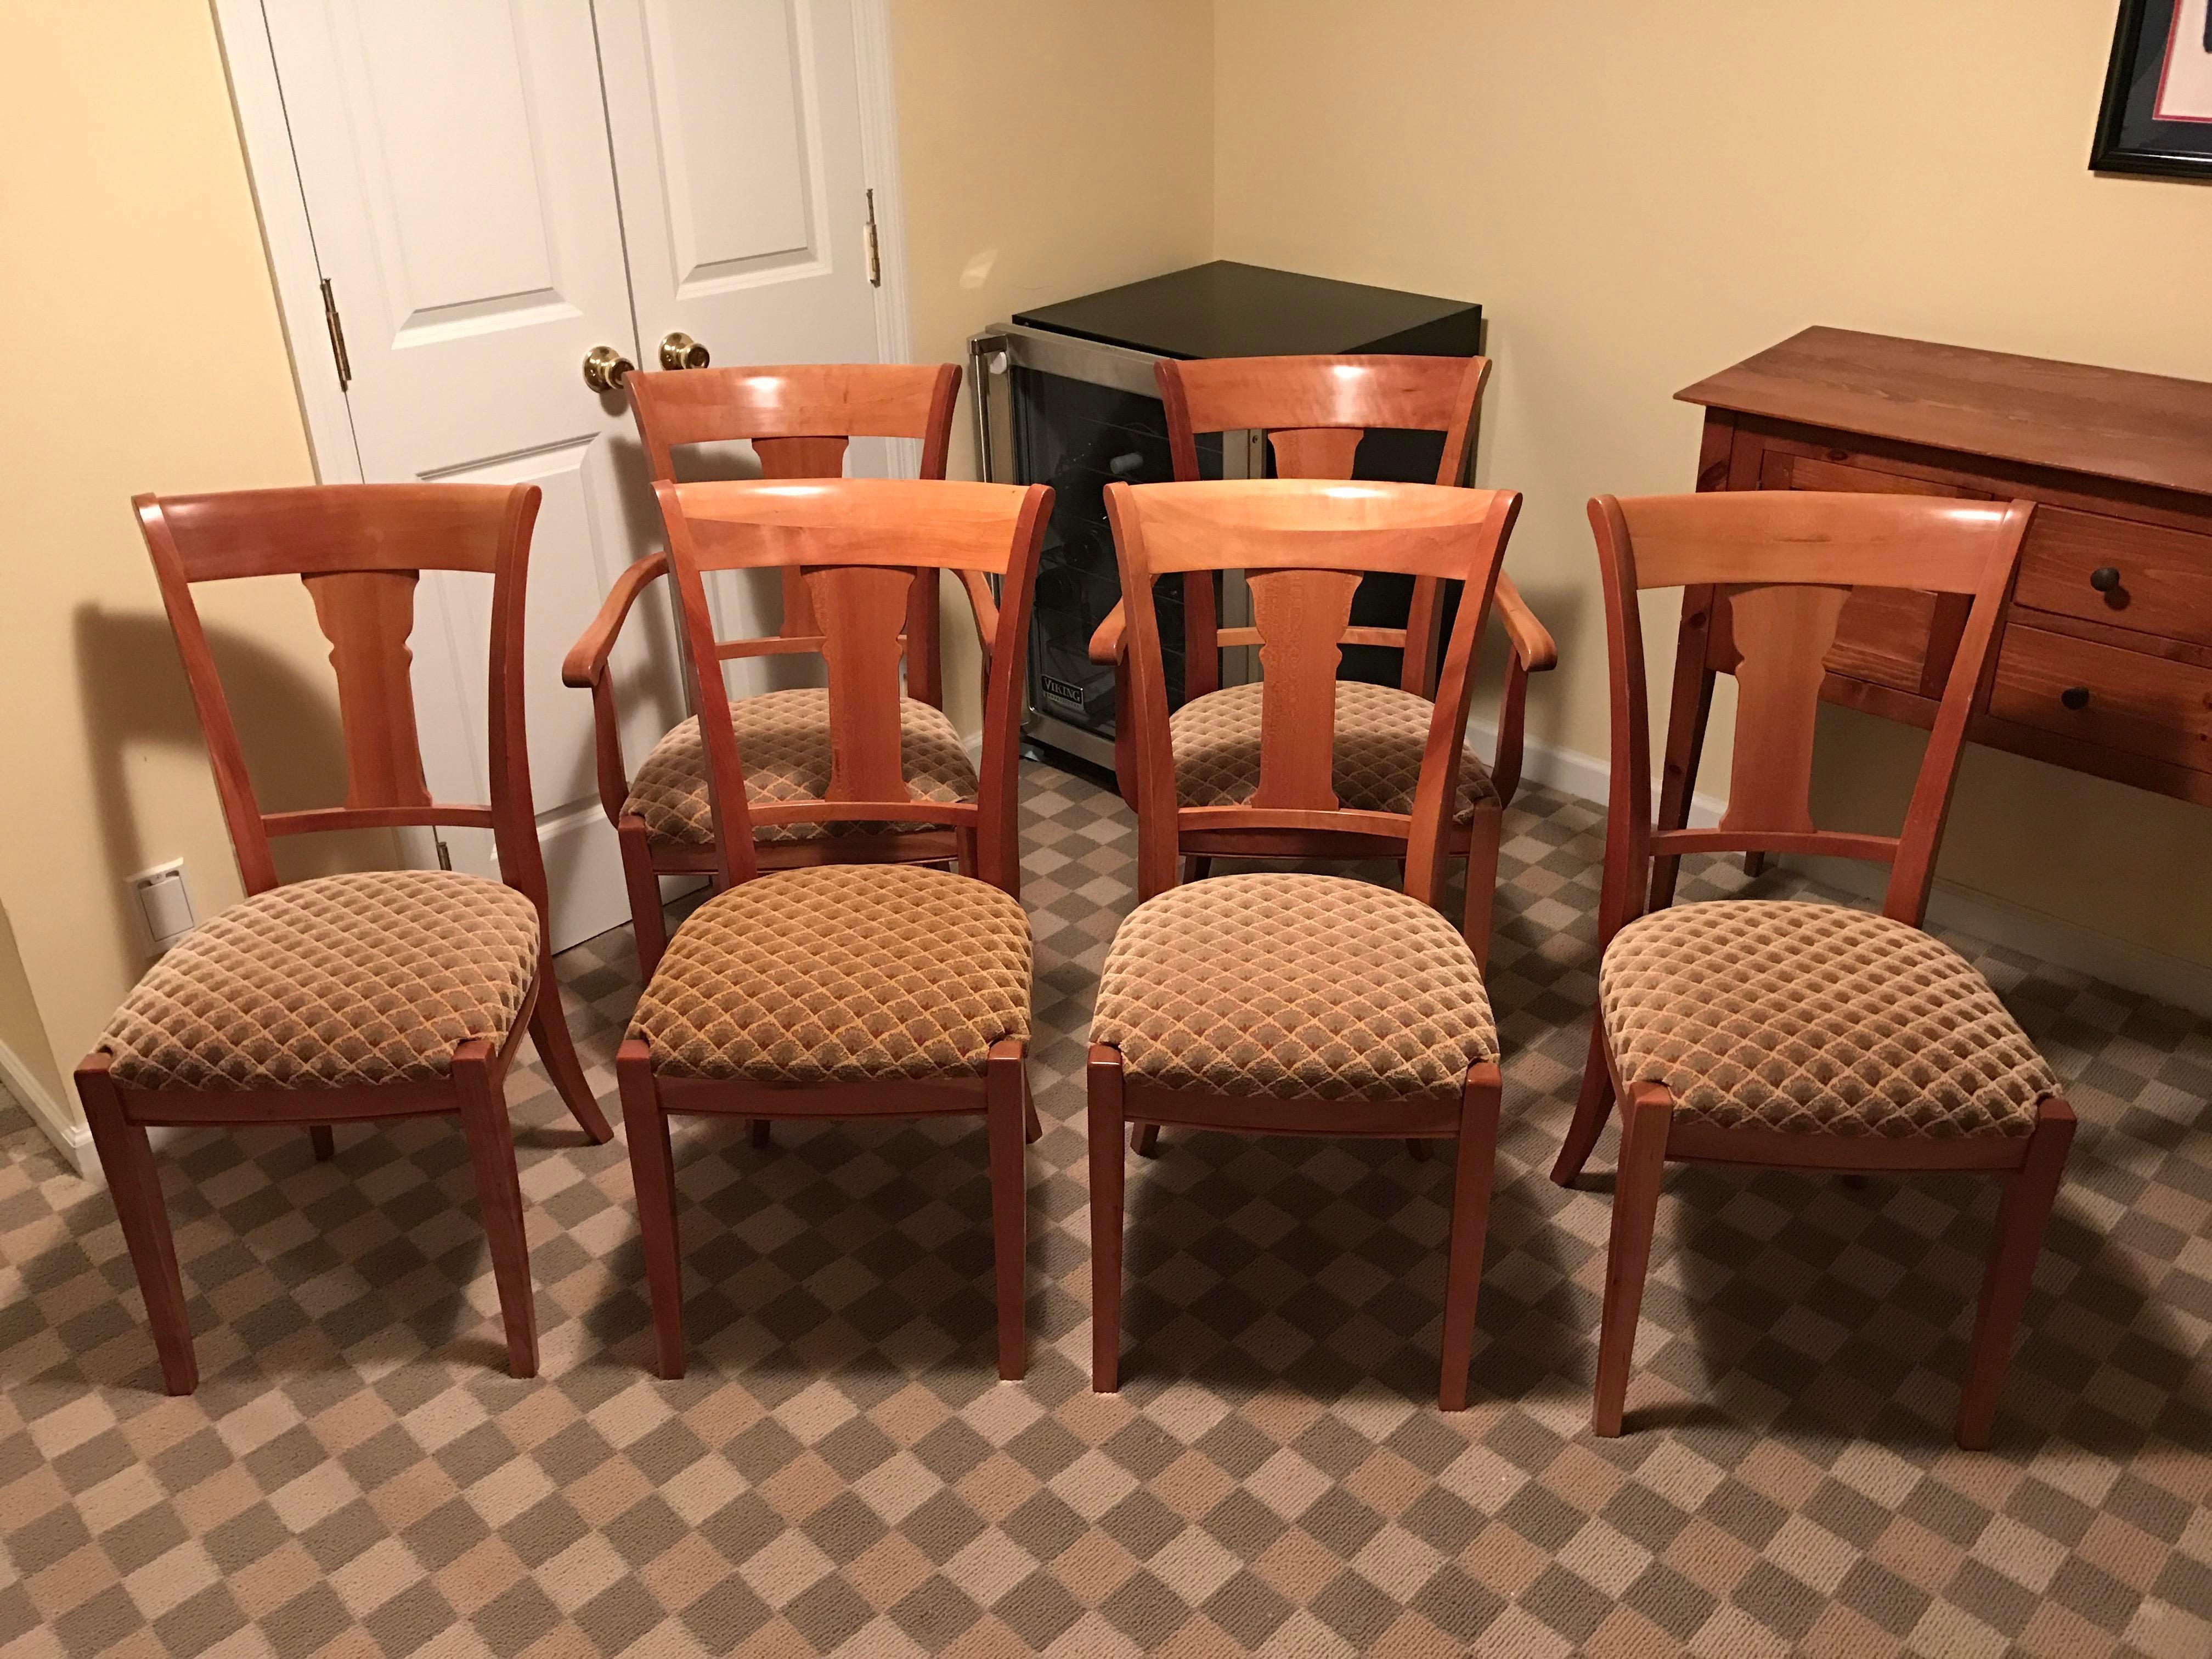 Grange Furniture Directoire Rochambeau Chairs   Set Of 6   Image 2 Of 11